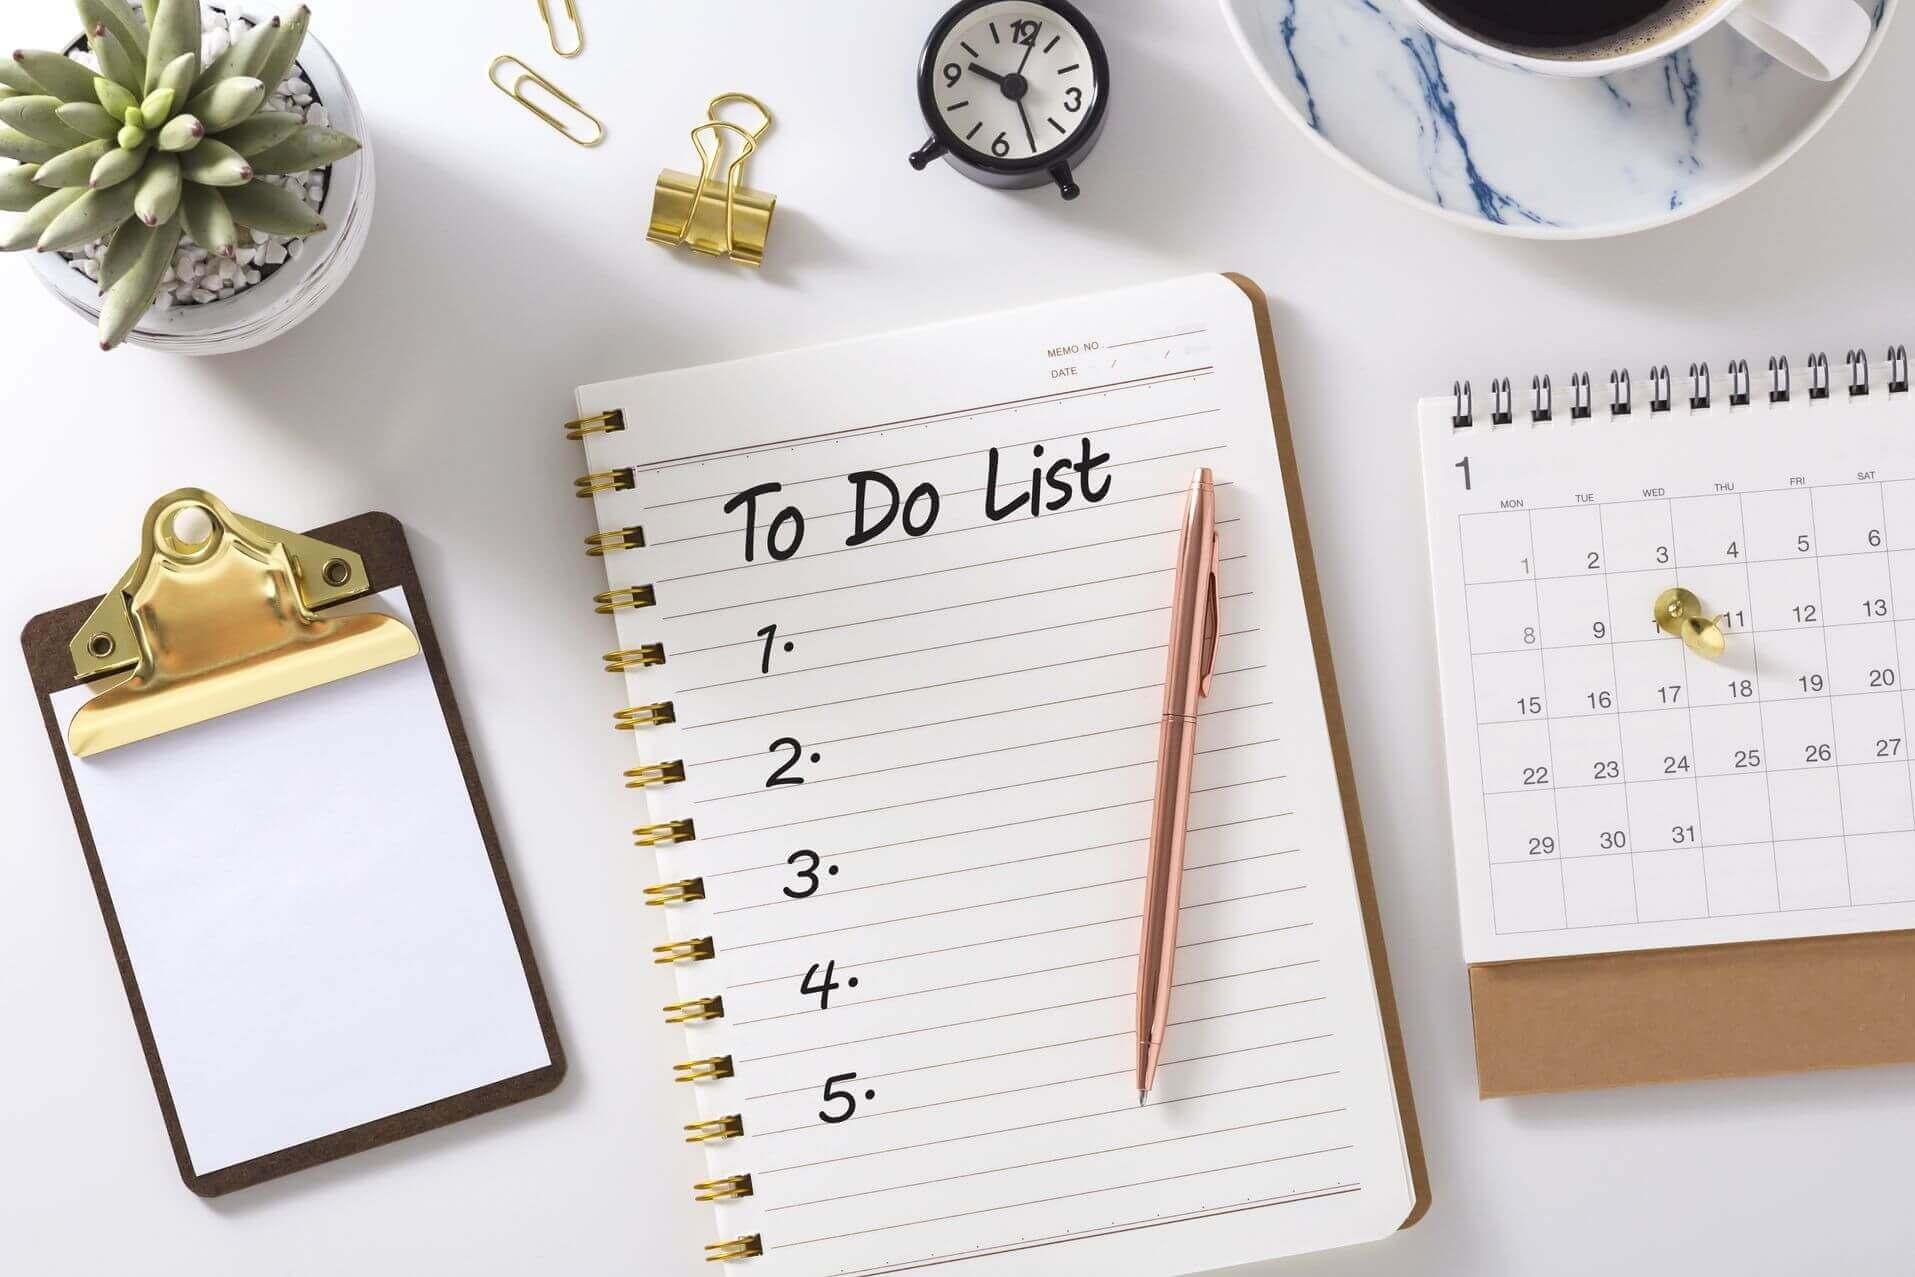 A to-do checklist.